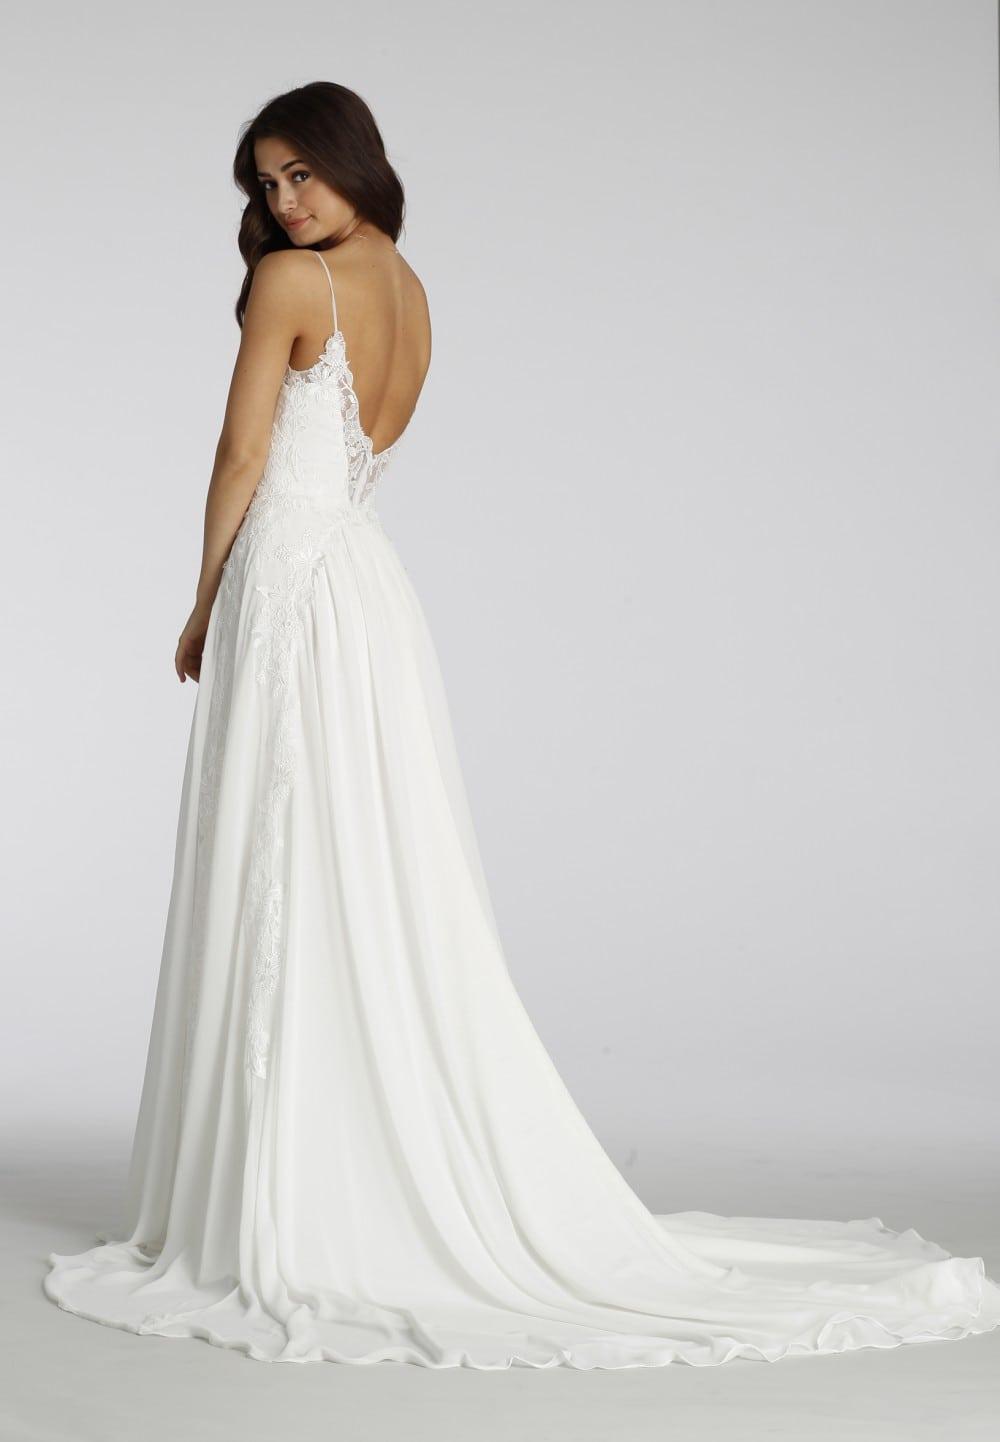 Low back wedding dress with spaghetti straps   Back detail Ti Adora Style 7654